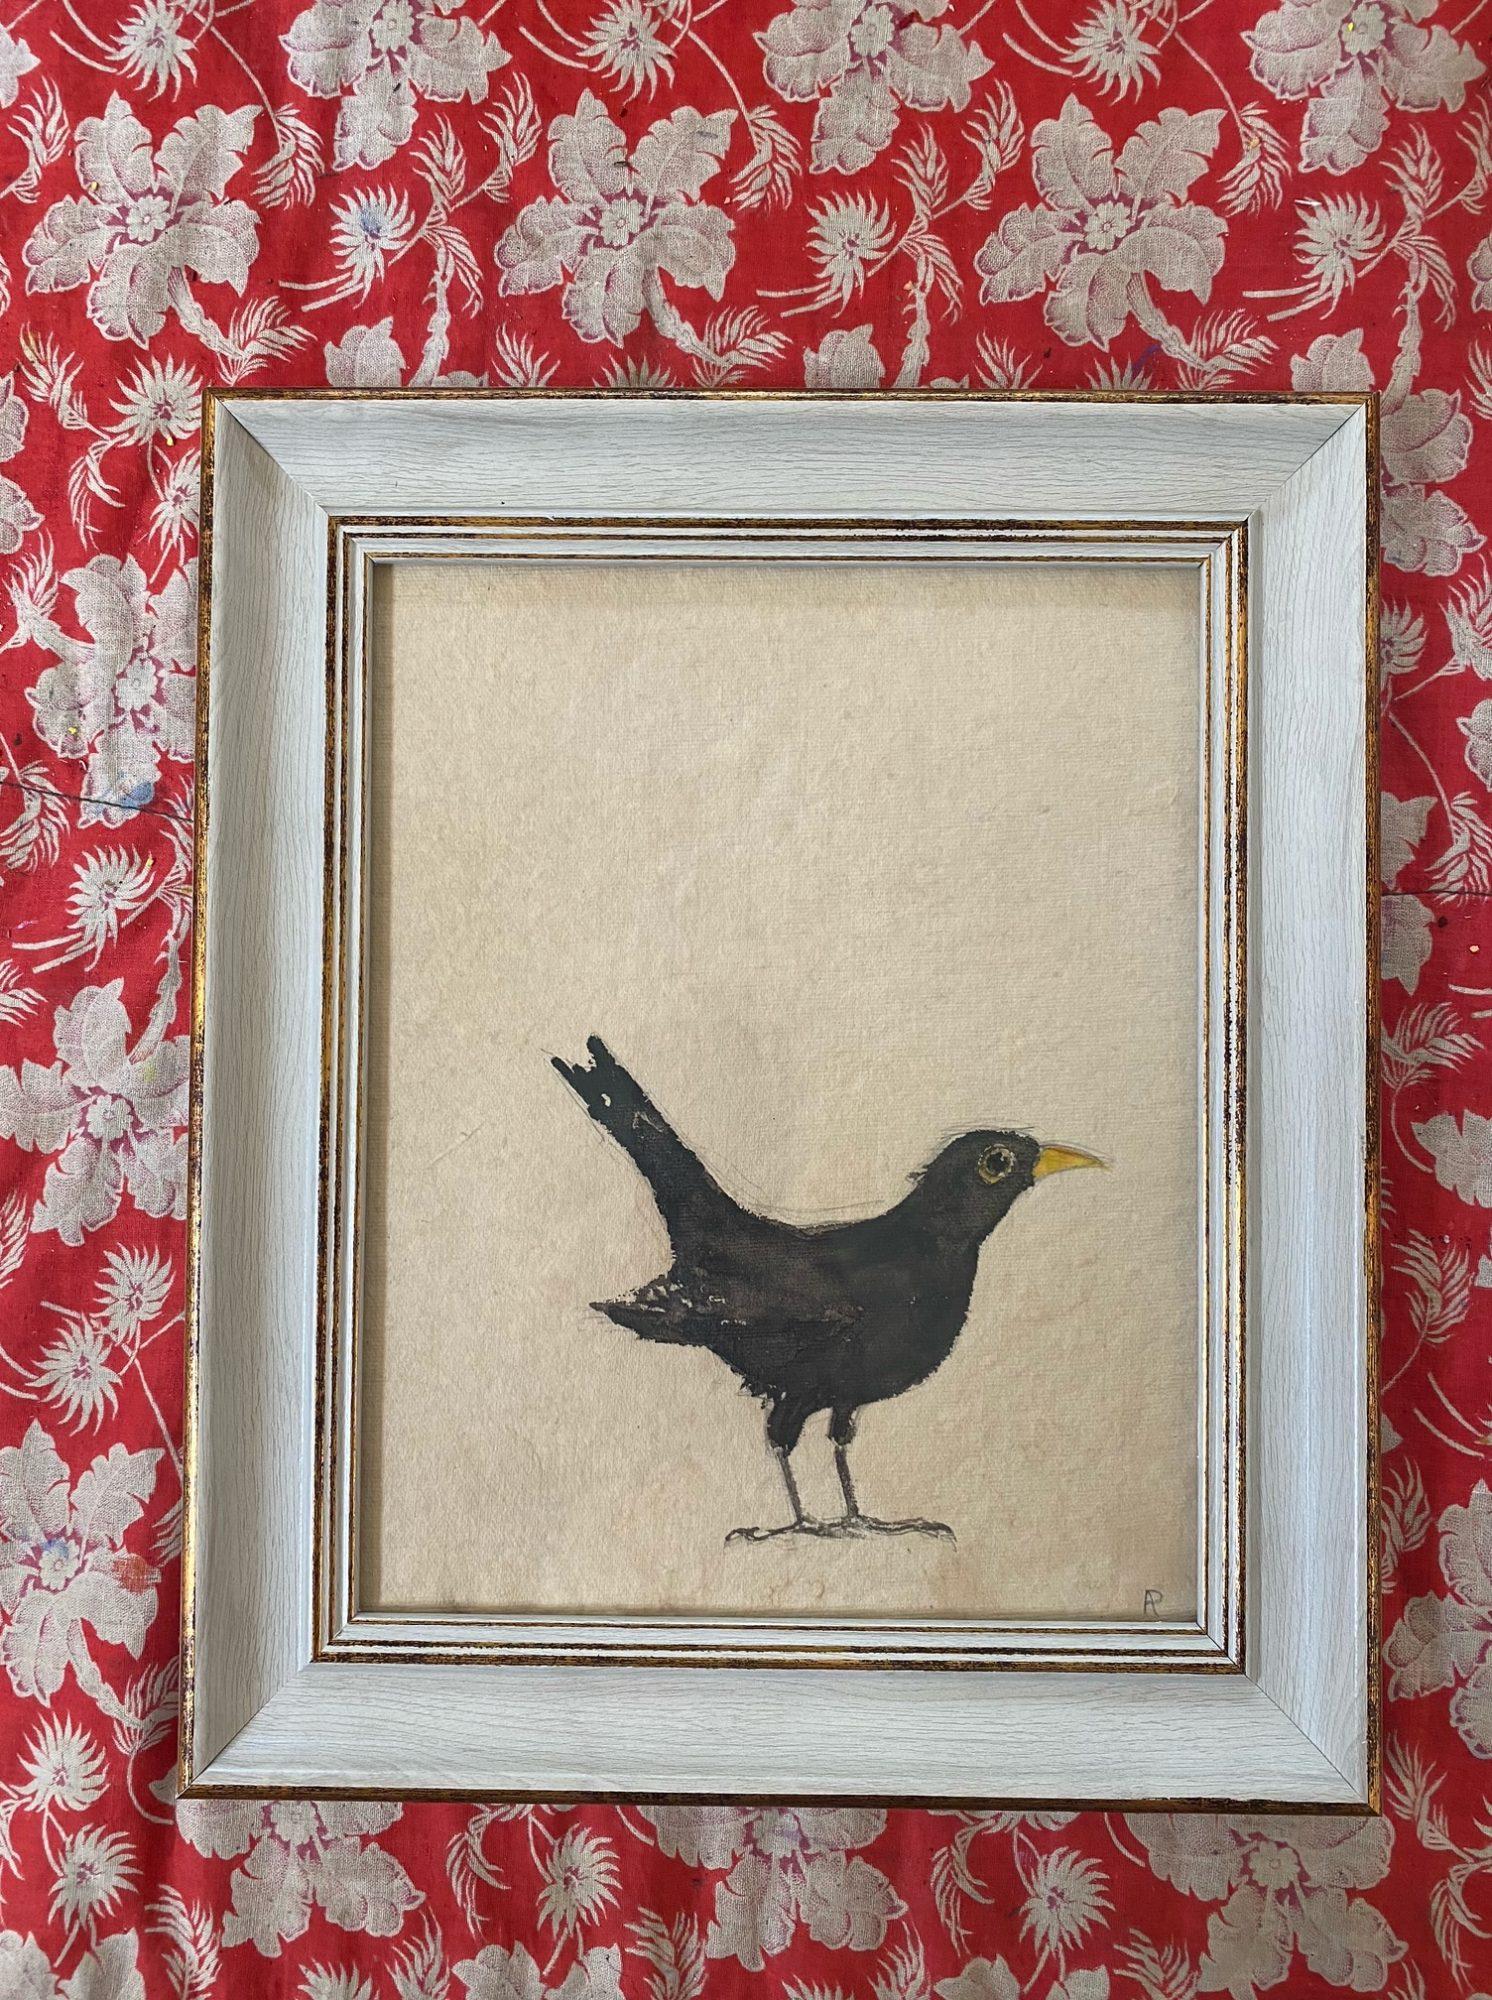 Hanford School-Art for the Art Barn Auction 28